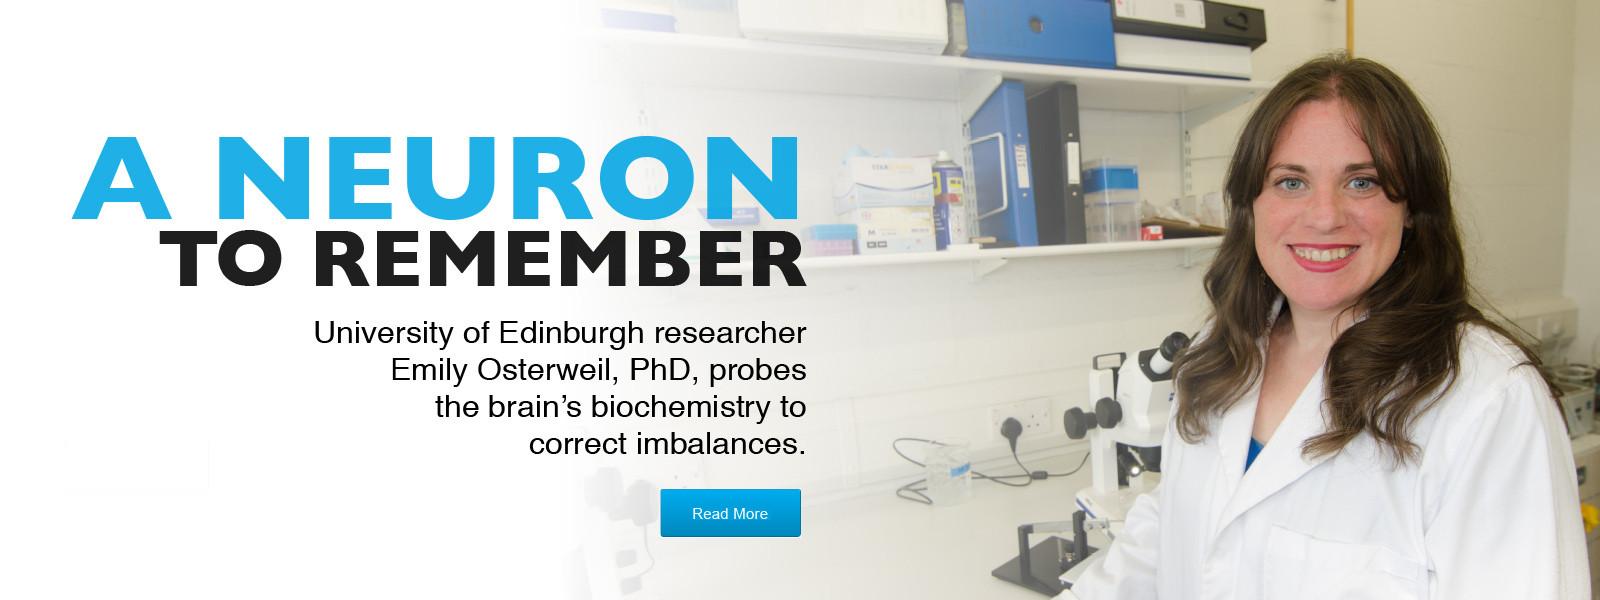 fragile X syndrome - University of Edinburgh researcher studies neurons